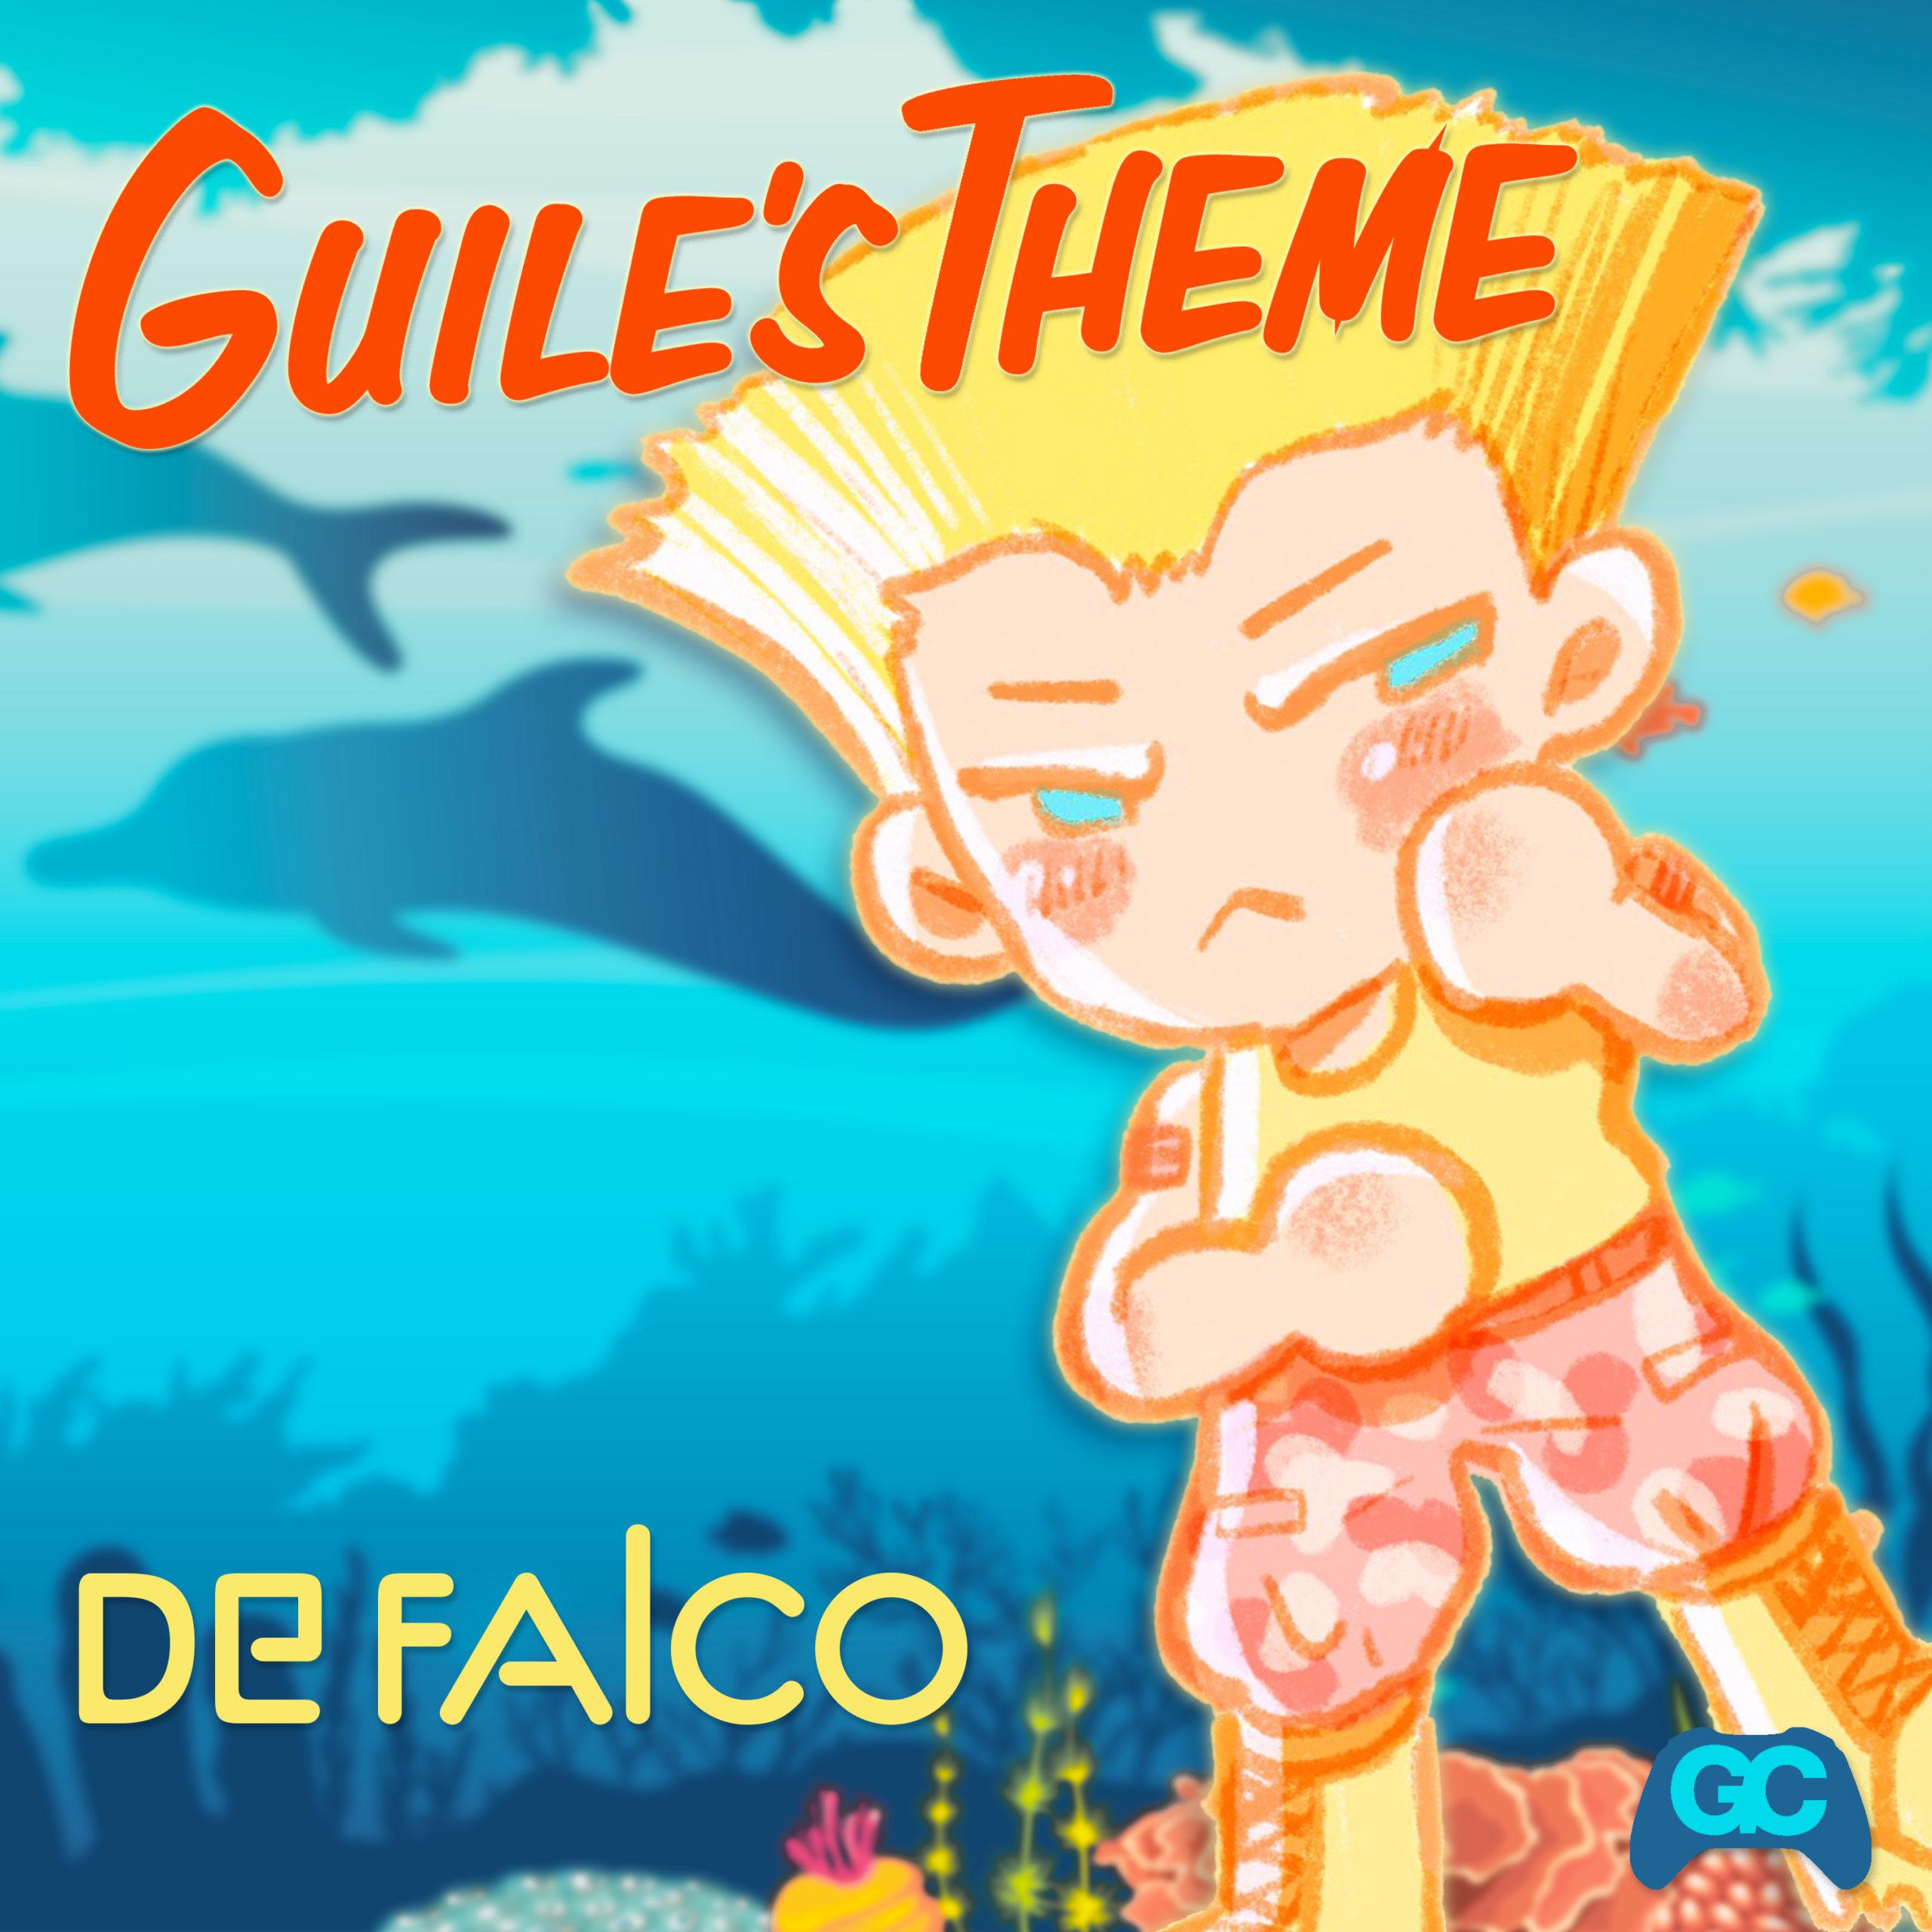 Guile's Theme – DeFalco